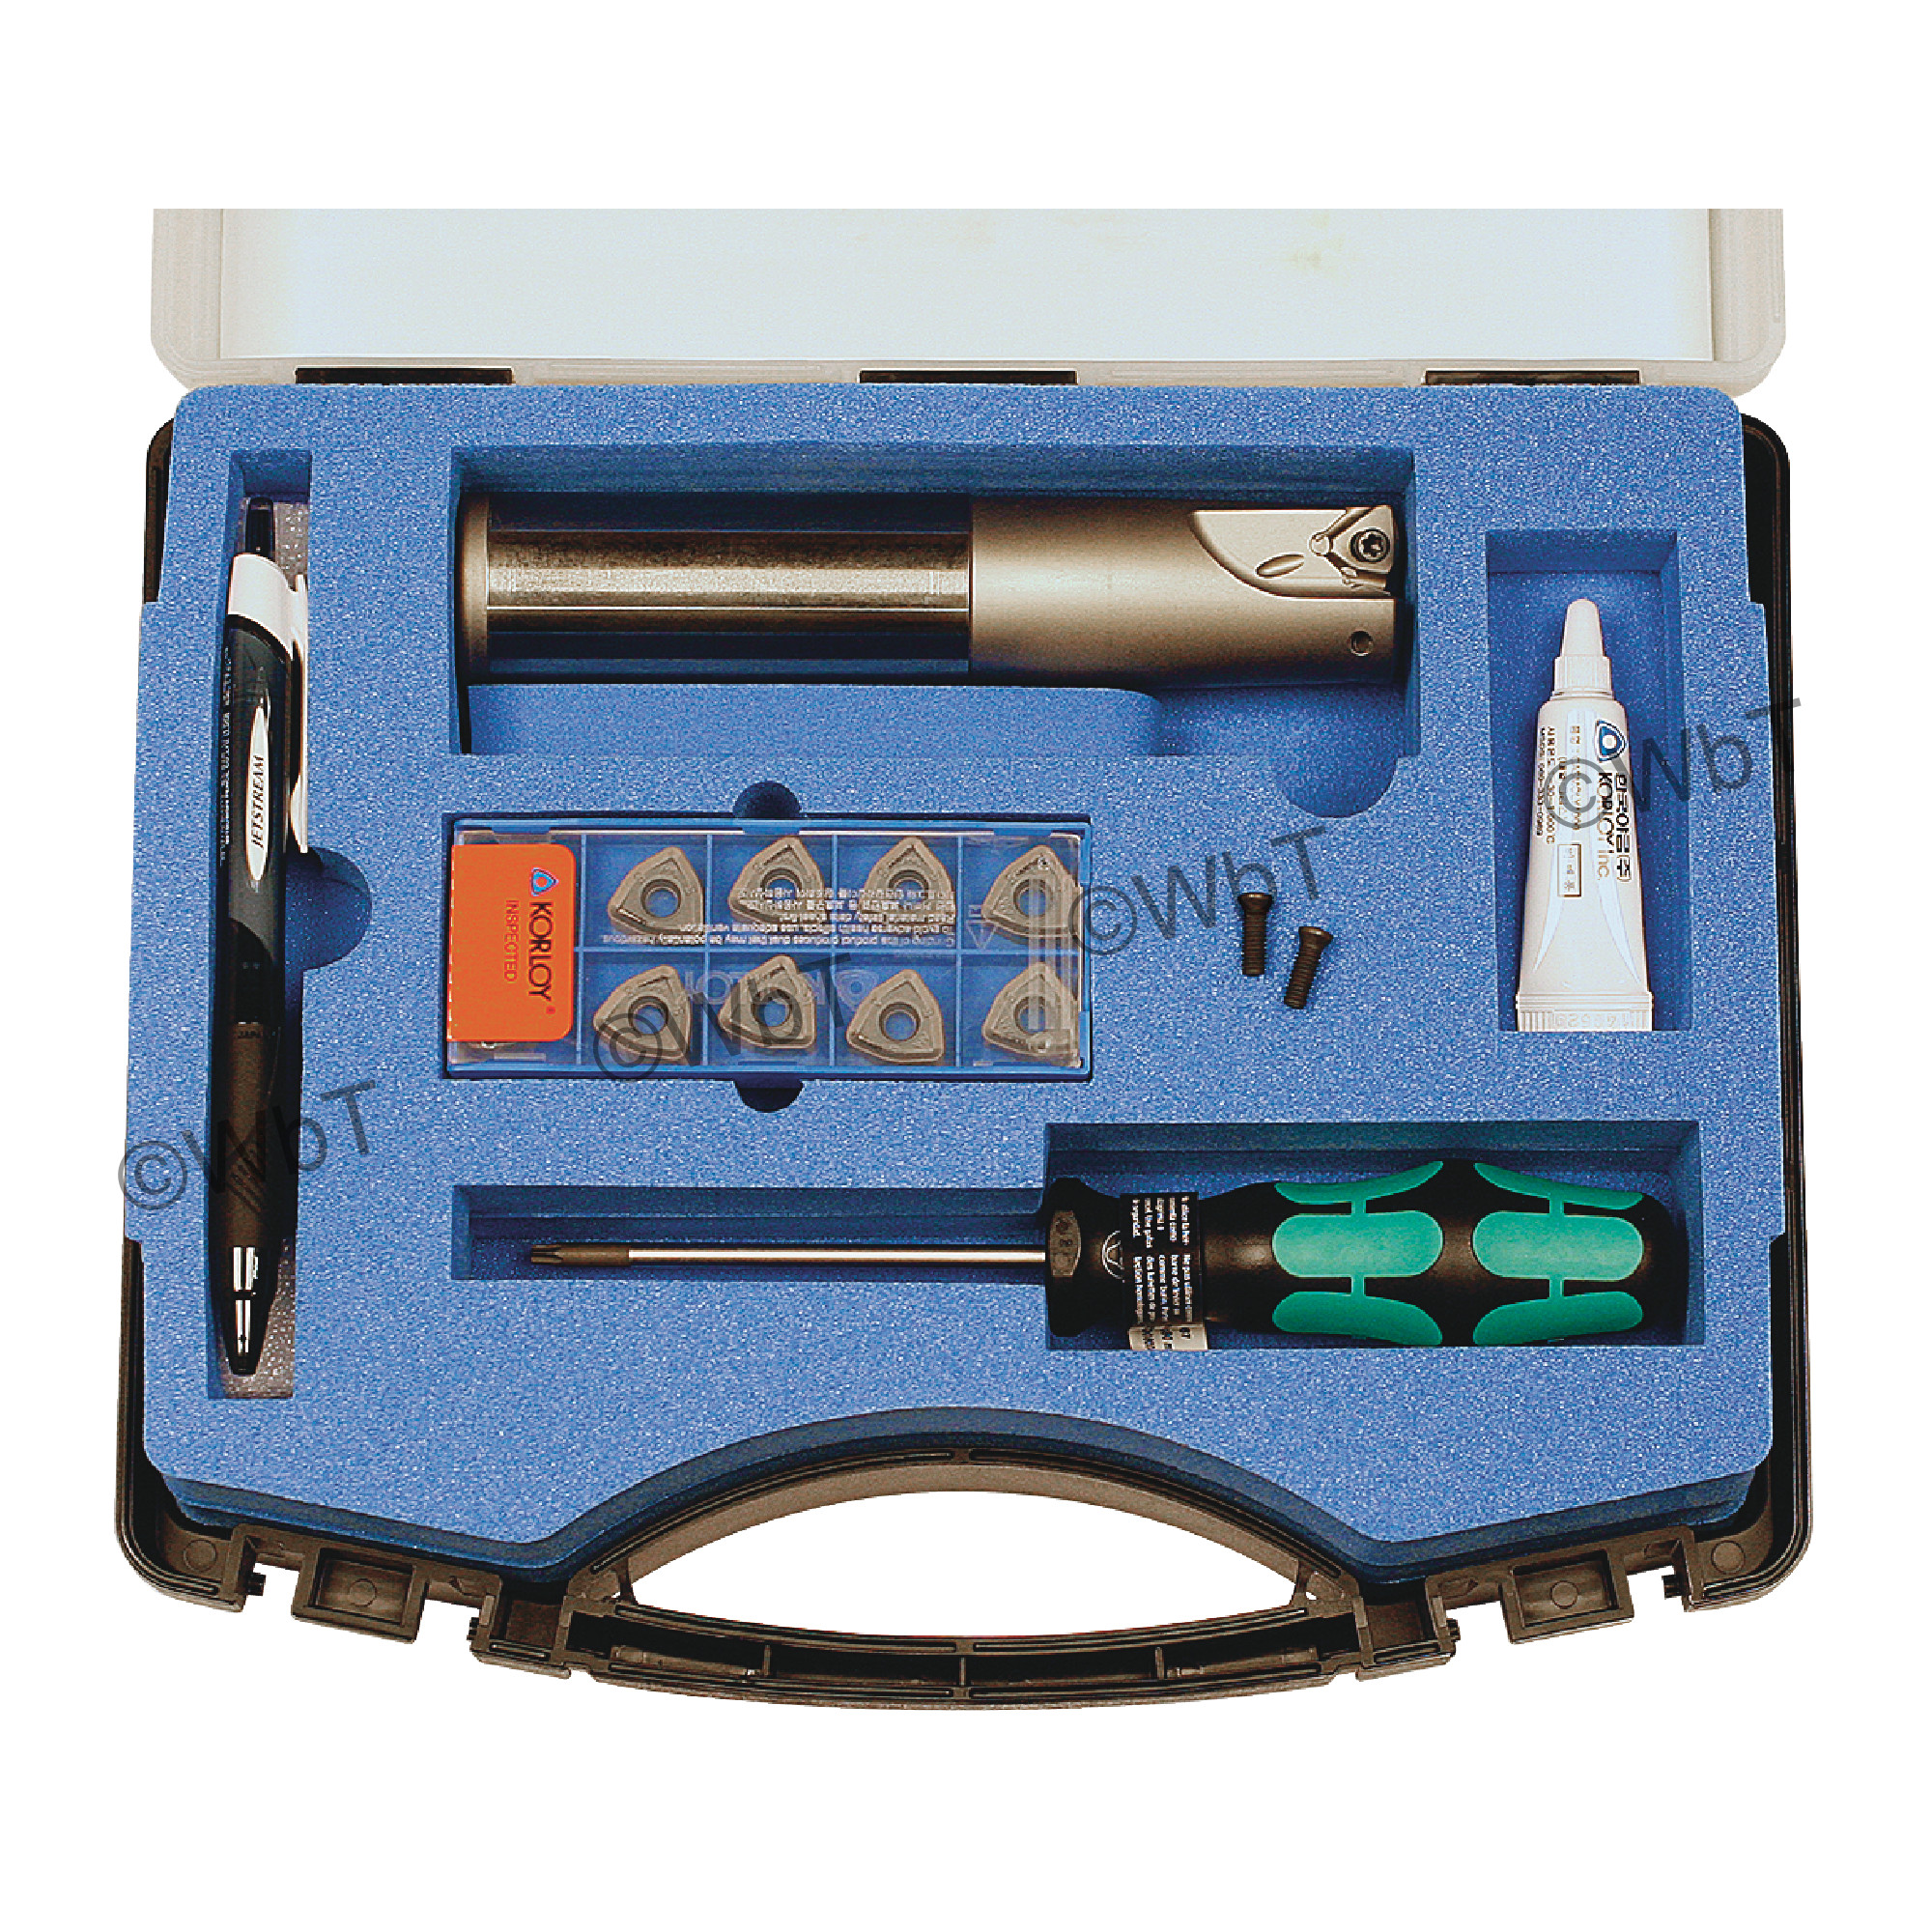 "KORLOY - 1.250"" High-Feed End Mill Set / Includes: (1) HRMDSA13125HR-2S125 (1.25"" ø) & (10) WNMX130520ZNN-MM PC53"